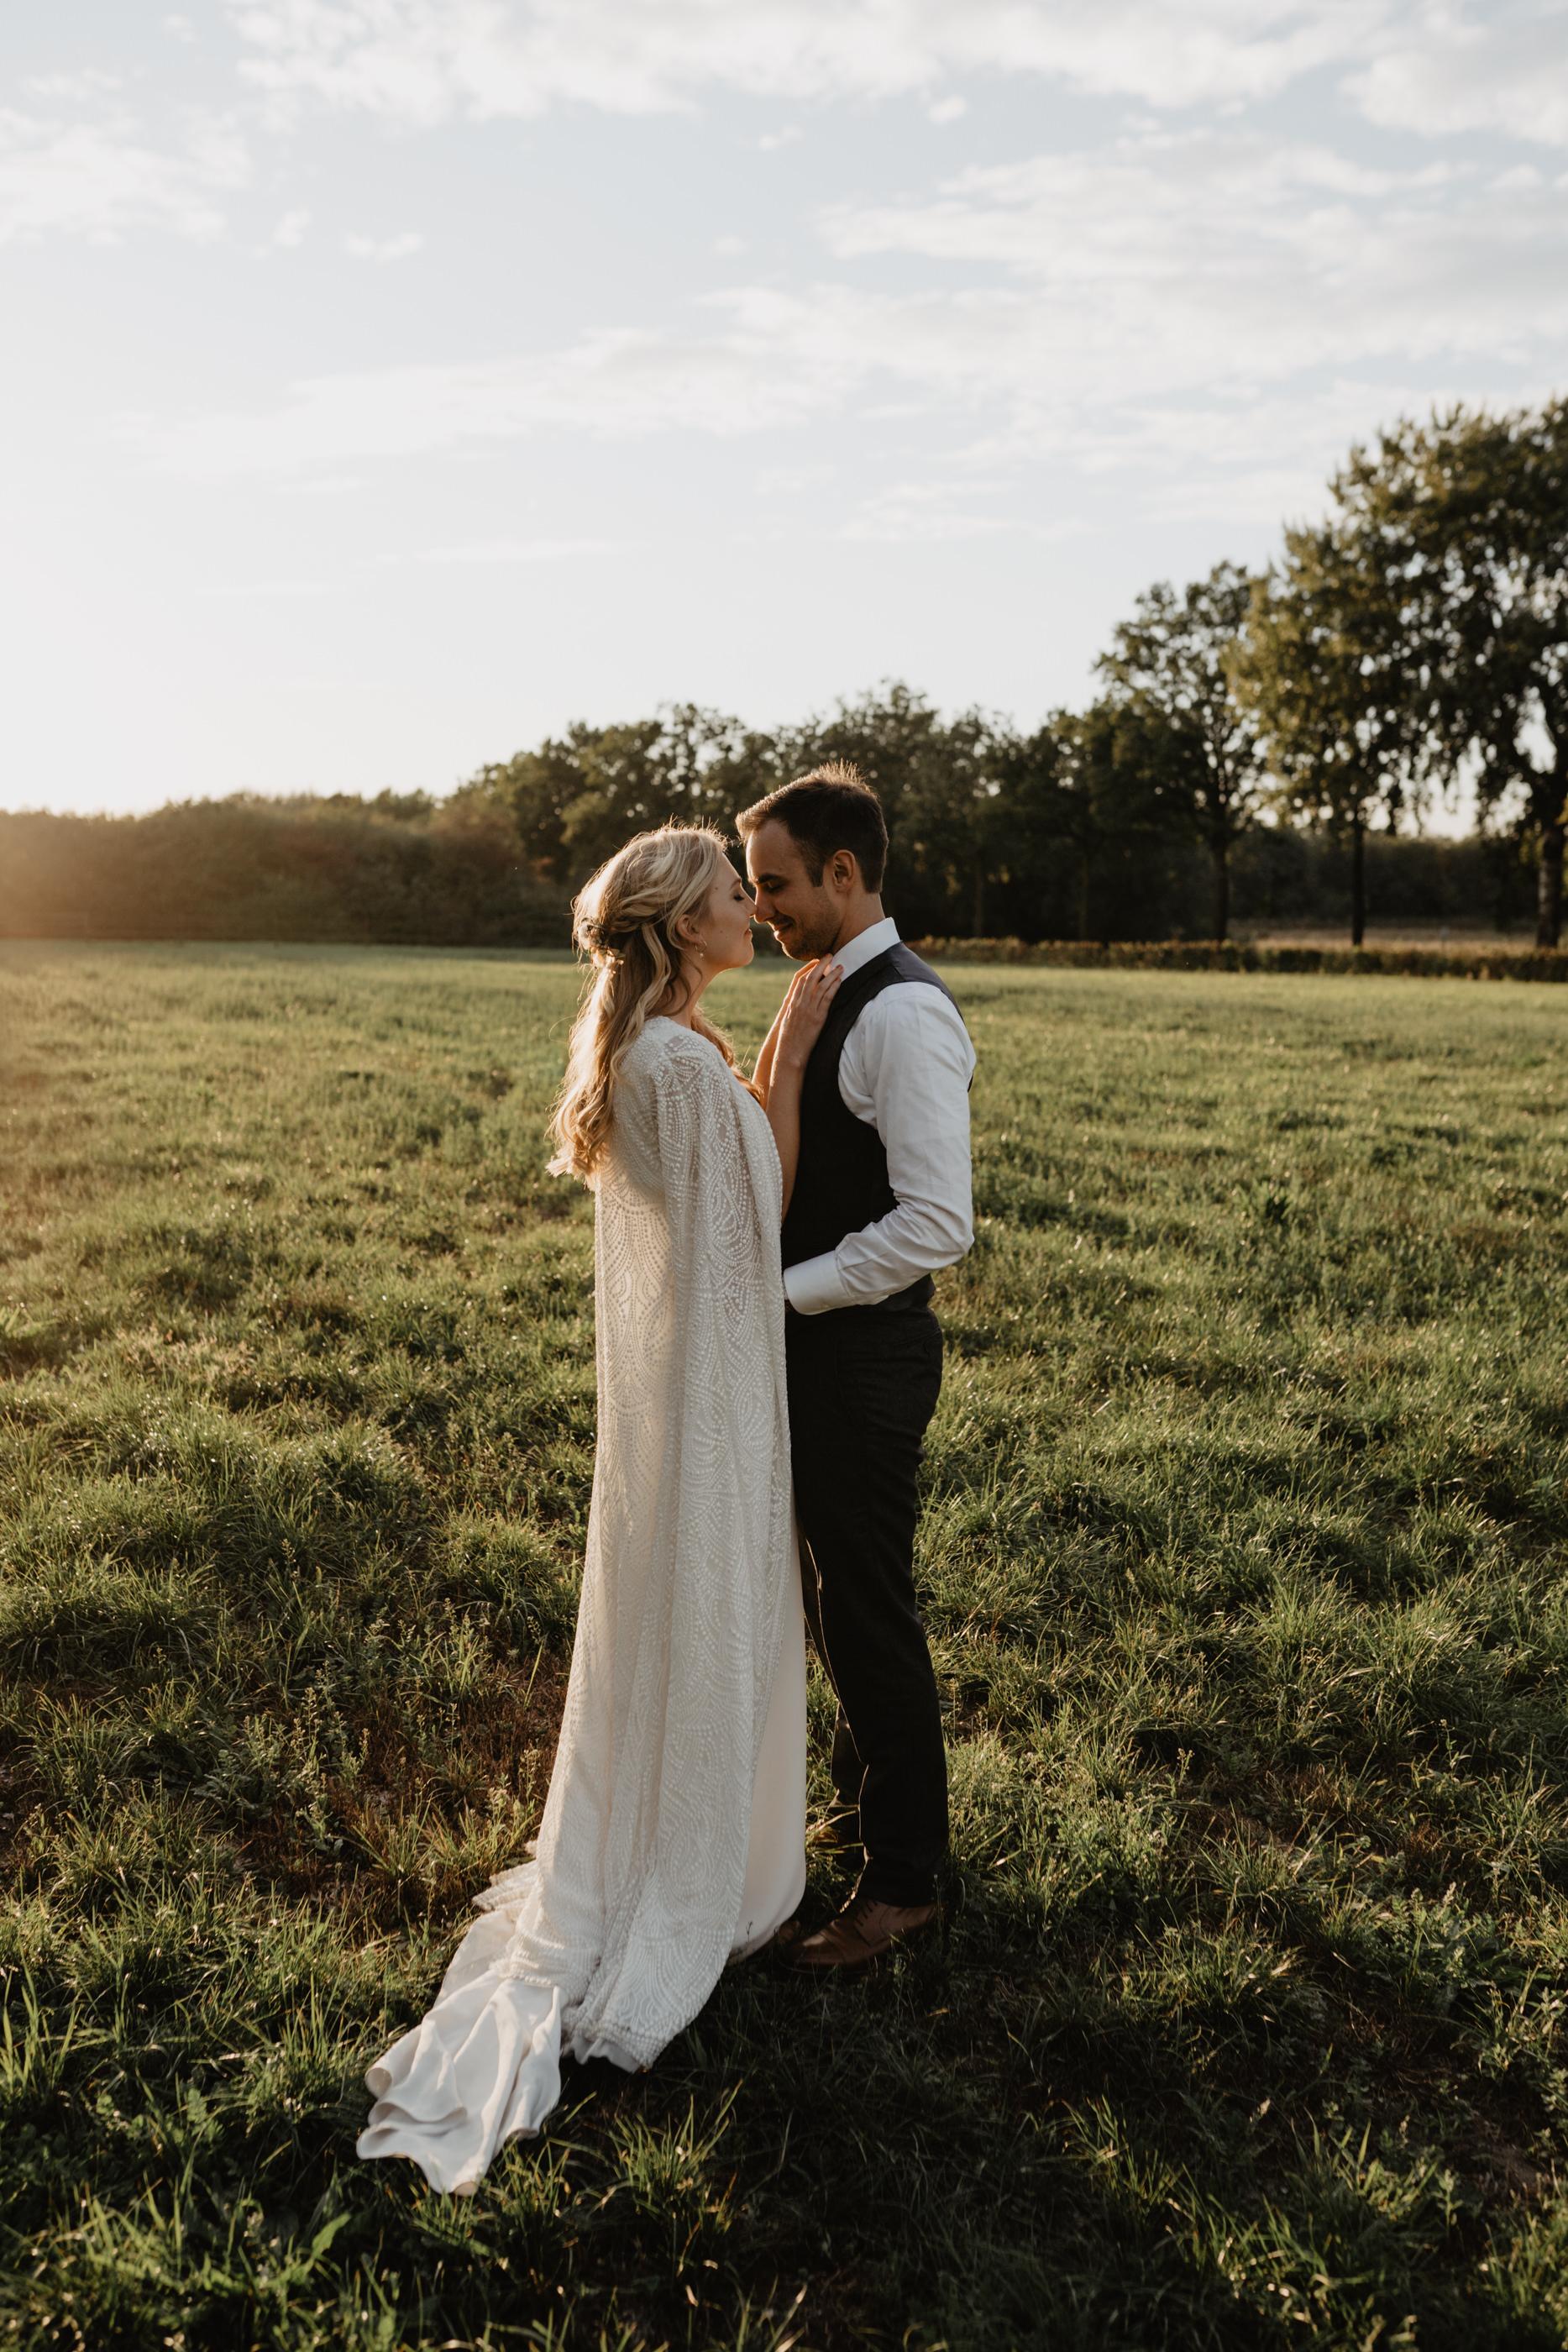 Angela-Bloemsaat-Over-the-moon-weddings72.jpg